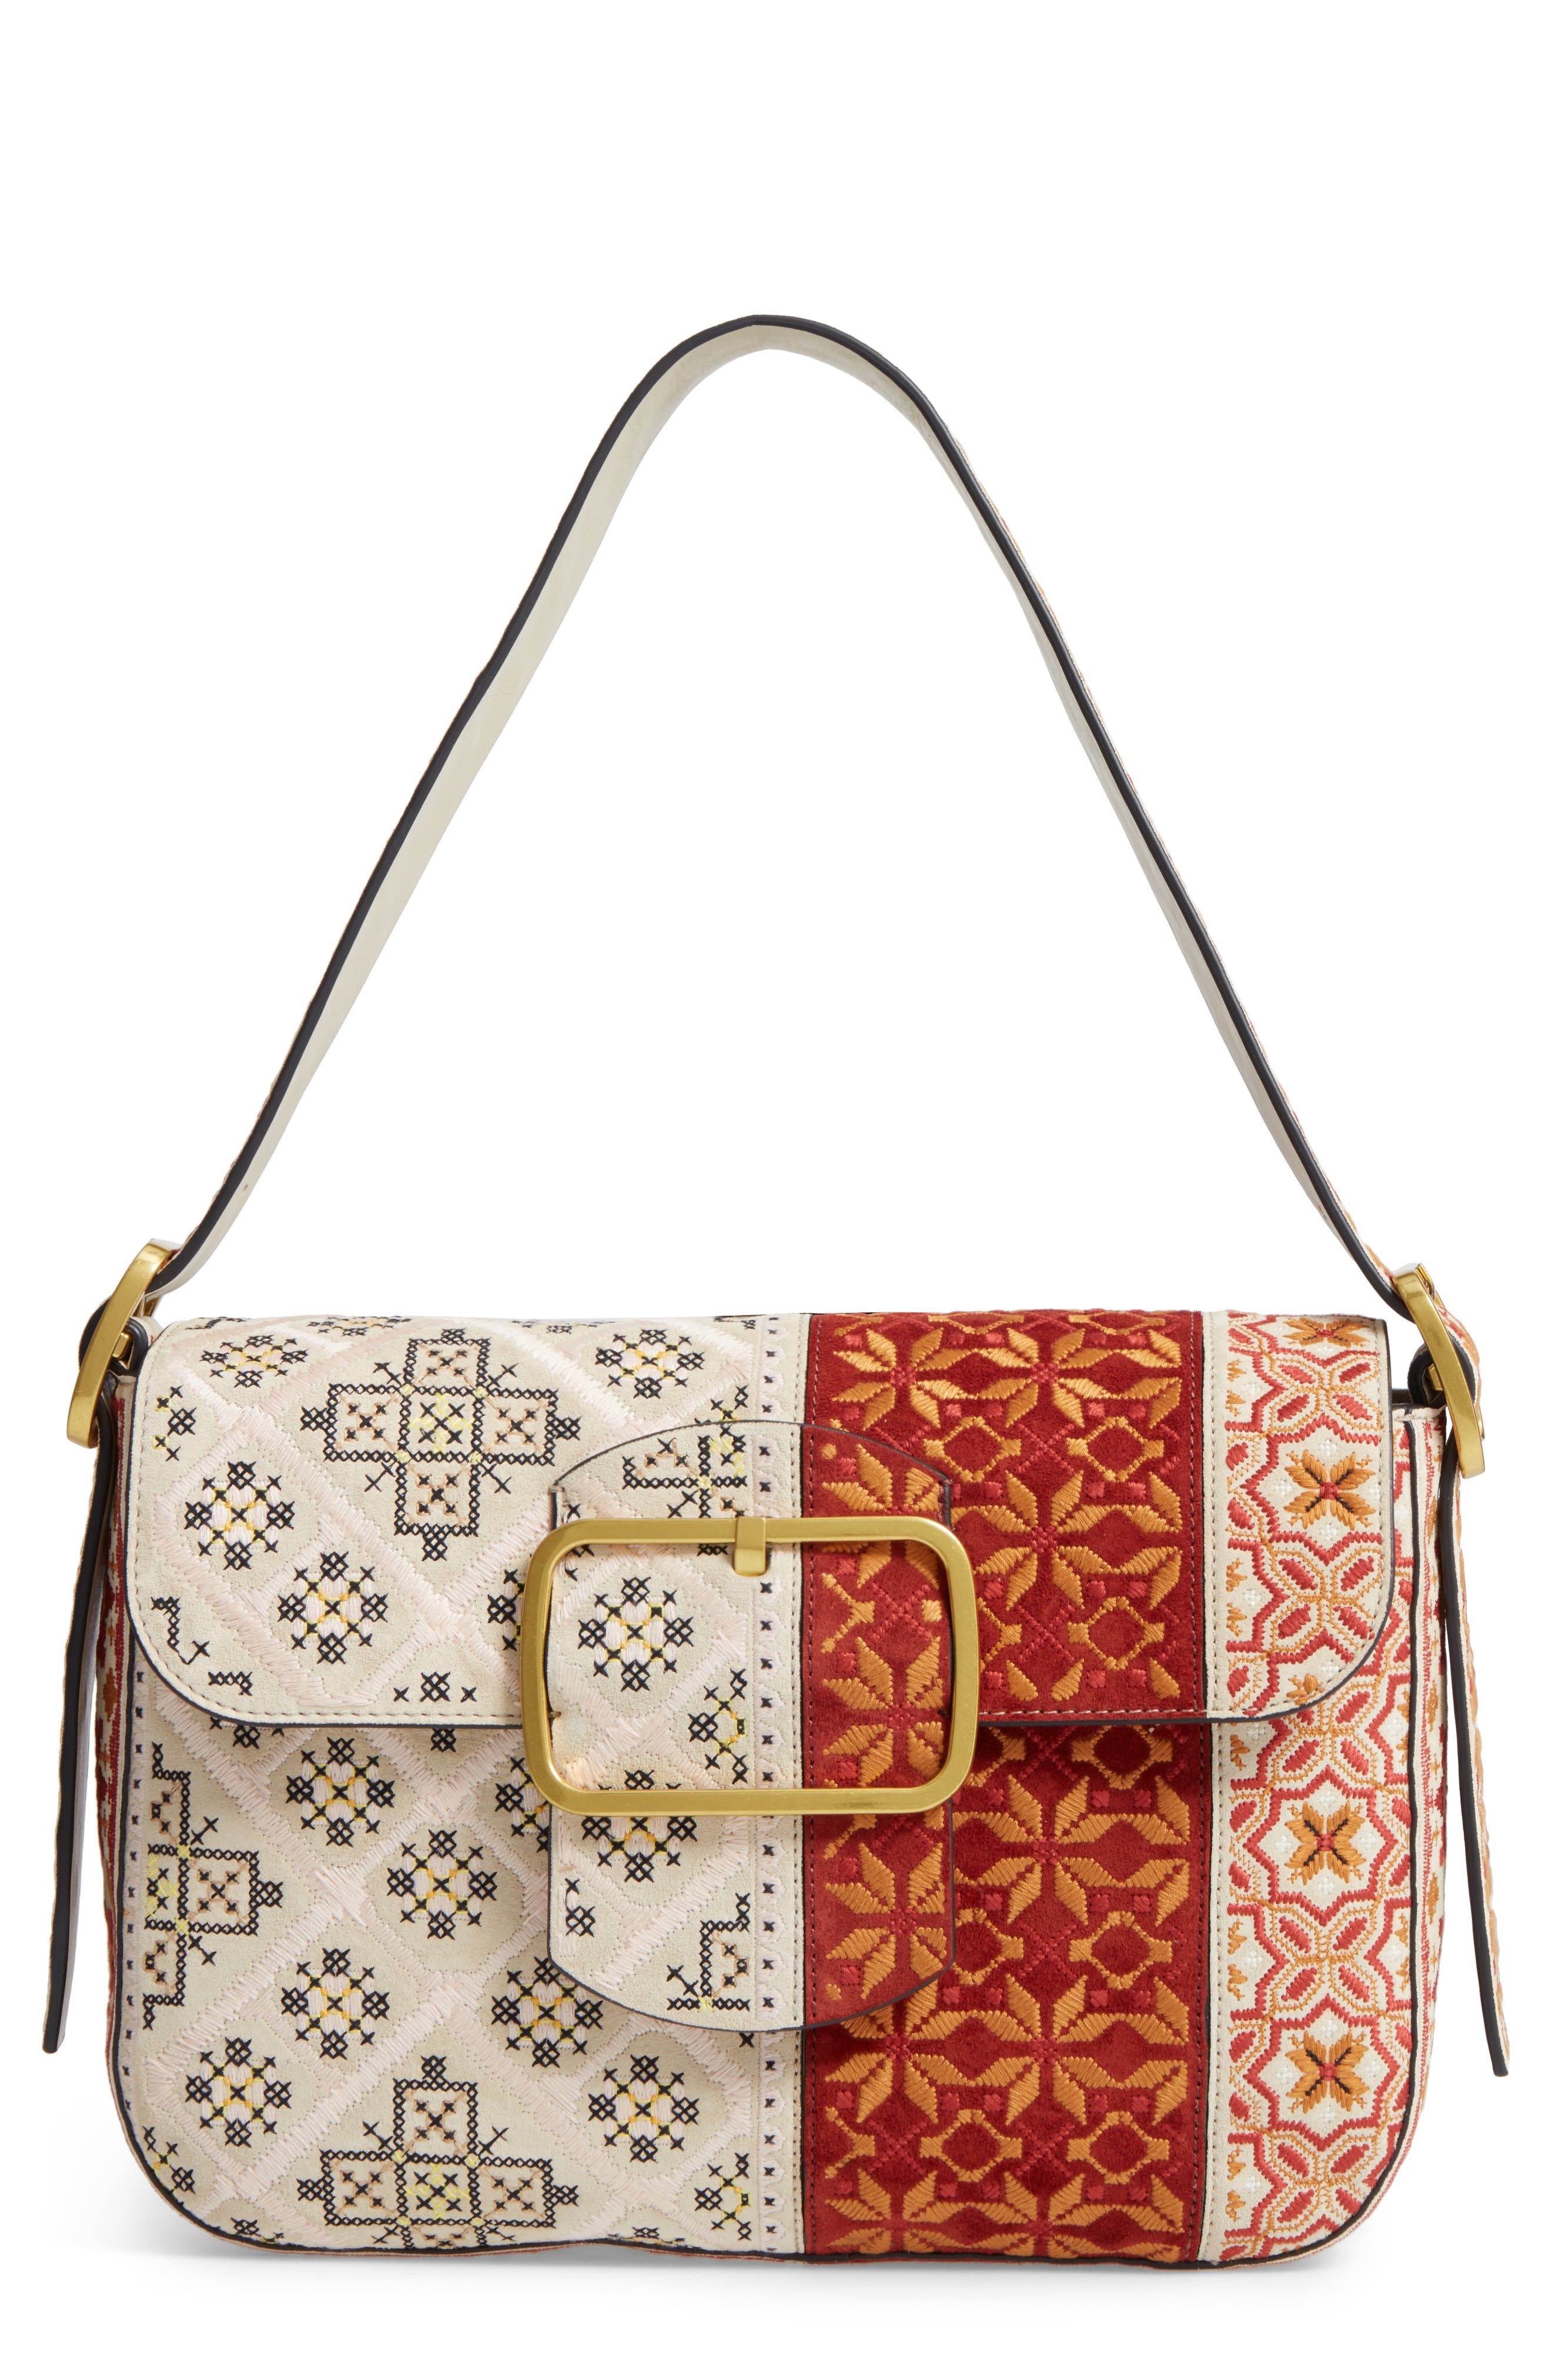 Main Image - Tory Burch Sawyer Embroidered Shoulder Bag